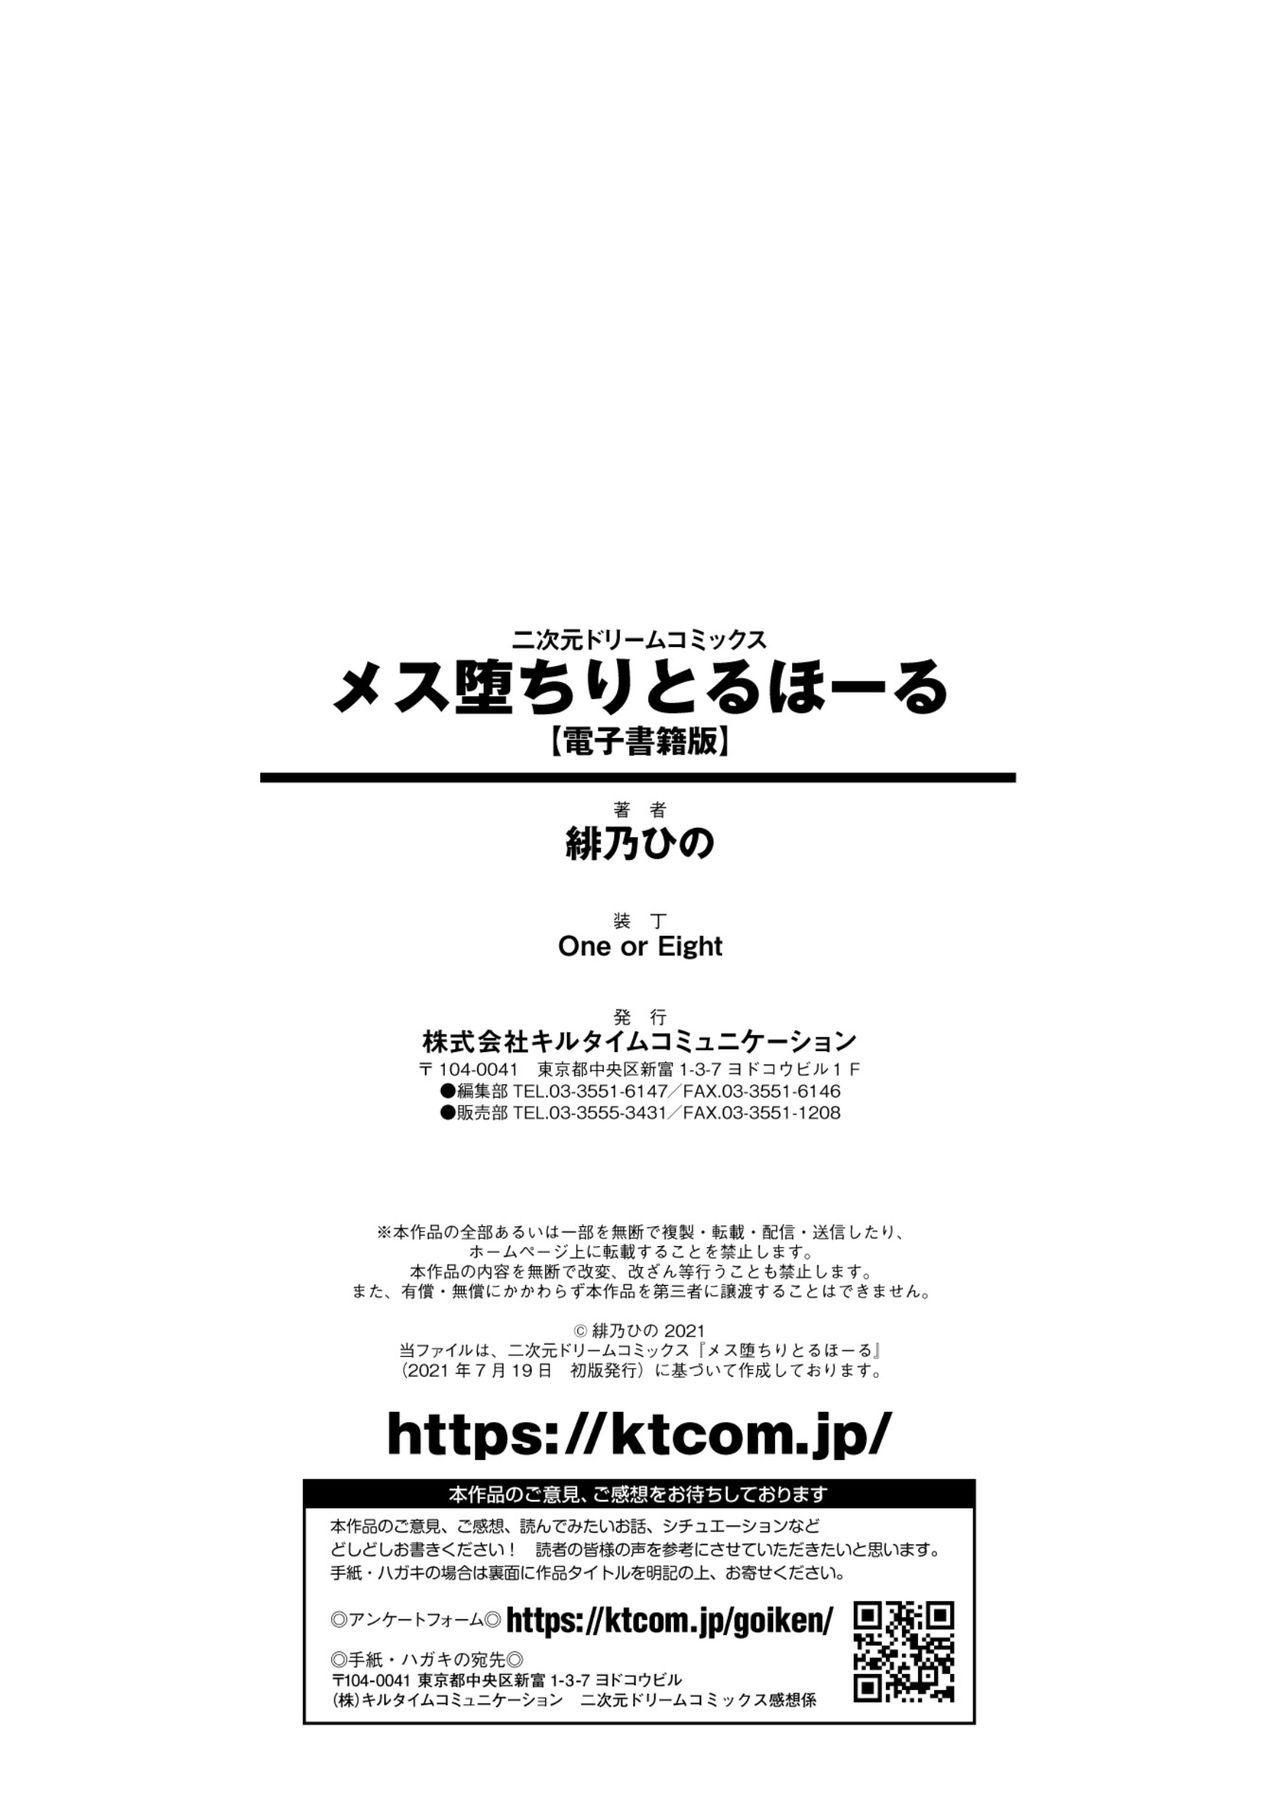 Mesuochi Little Hole 185